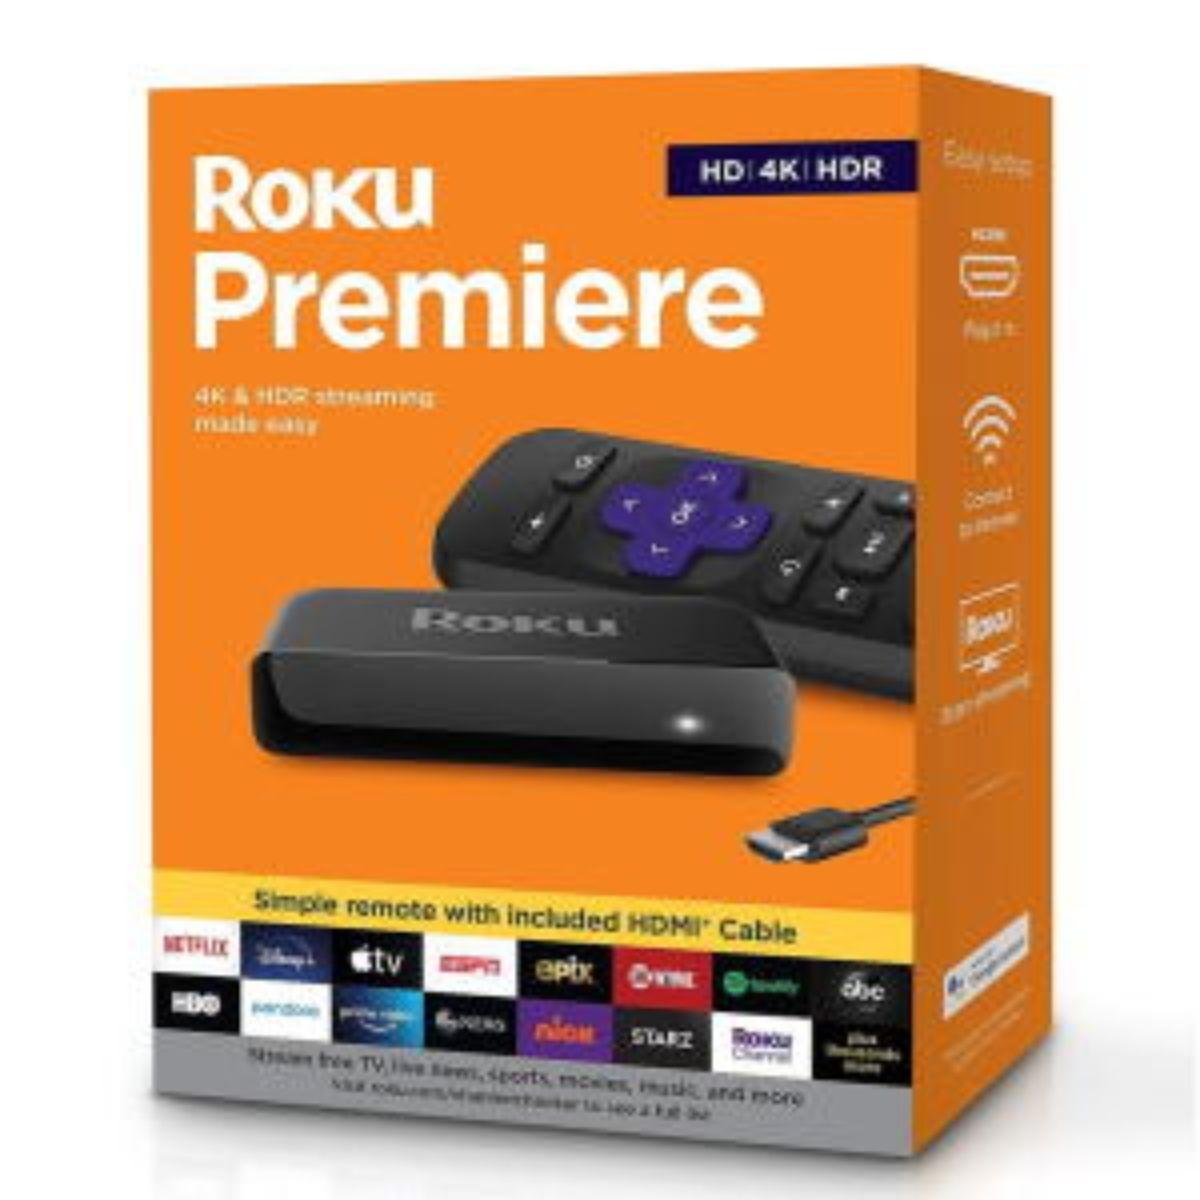 roku premiere reproductor multimedia de transmision hd 4k hdr 1 1